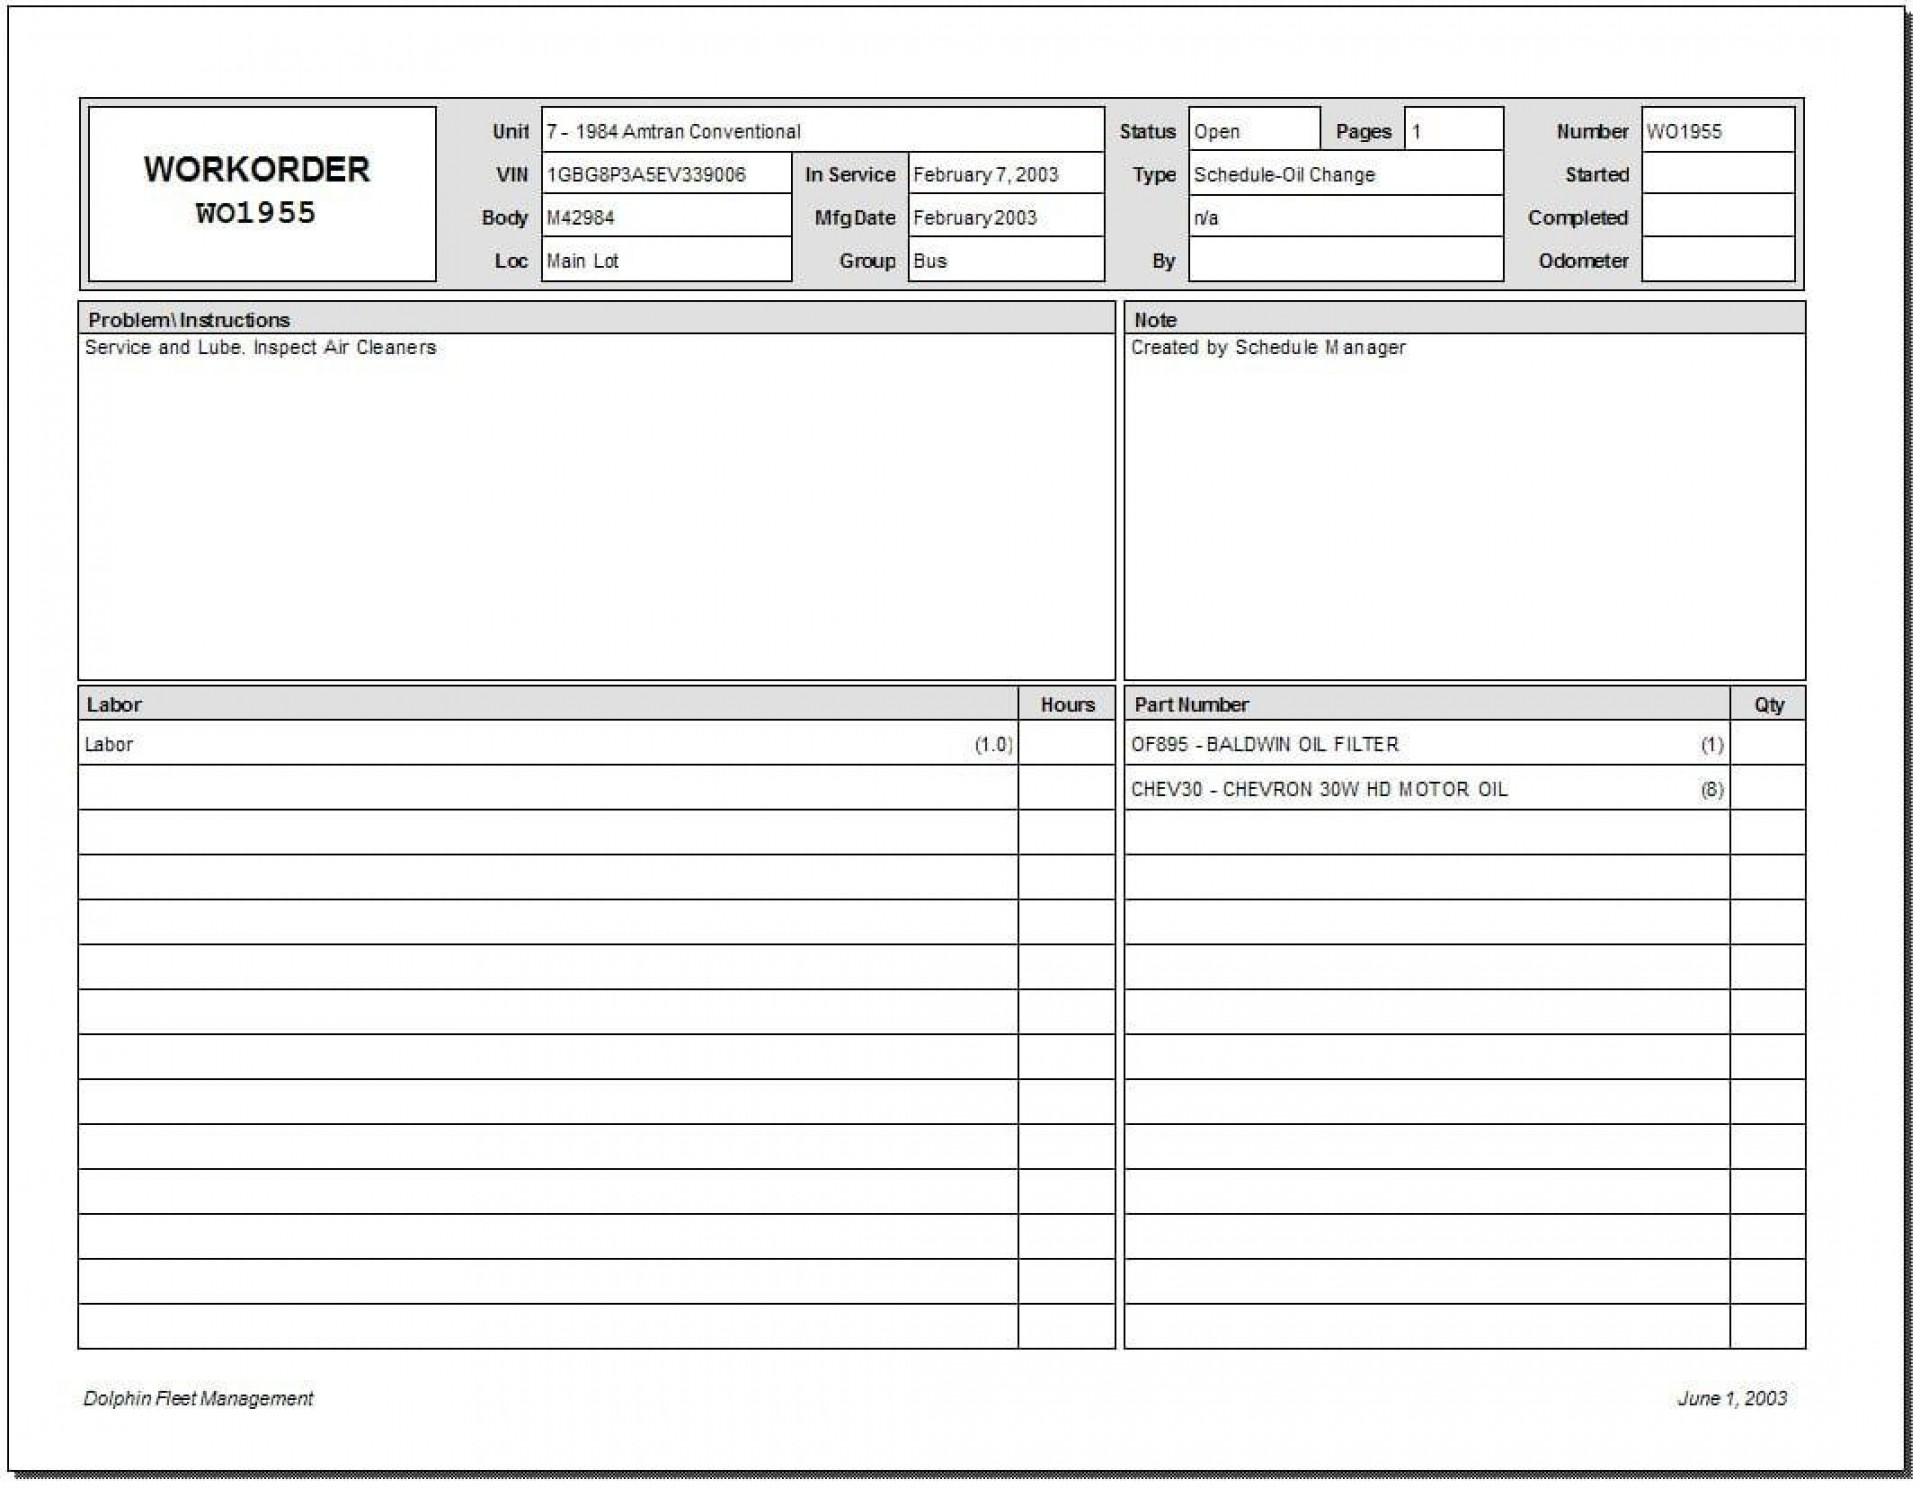 008 Fantastic Microsoft Excel Work Order Template Inspiration 1920